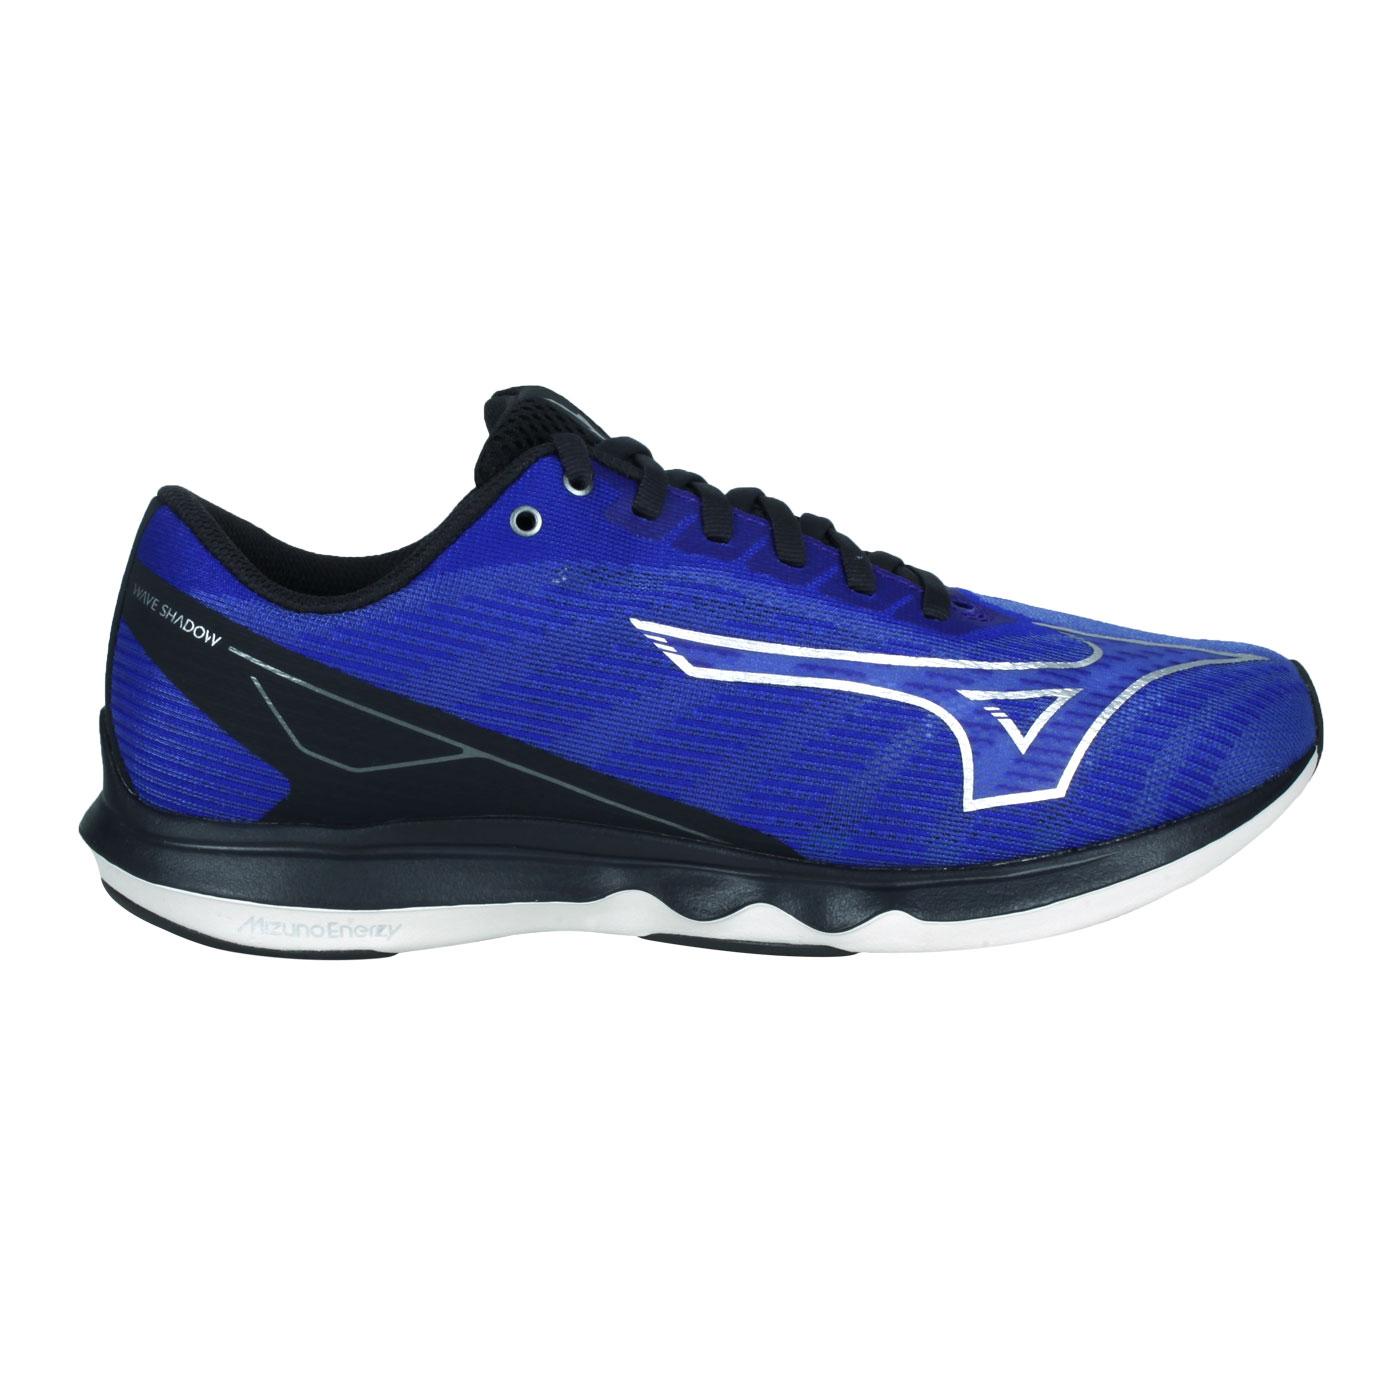 MIZUNO 男款慢跑鞋-WIDE  @WAVE SHADOW 5 WIDE@J1GC212705 - 藍黑銀